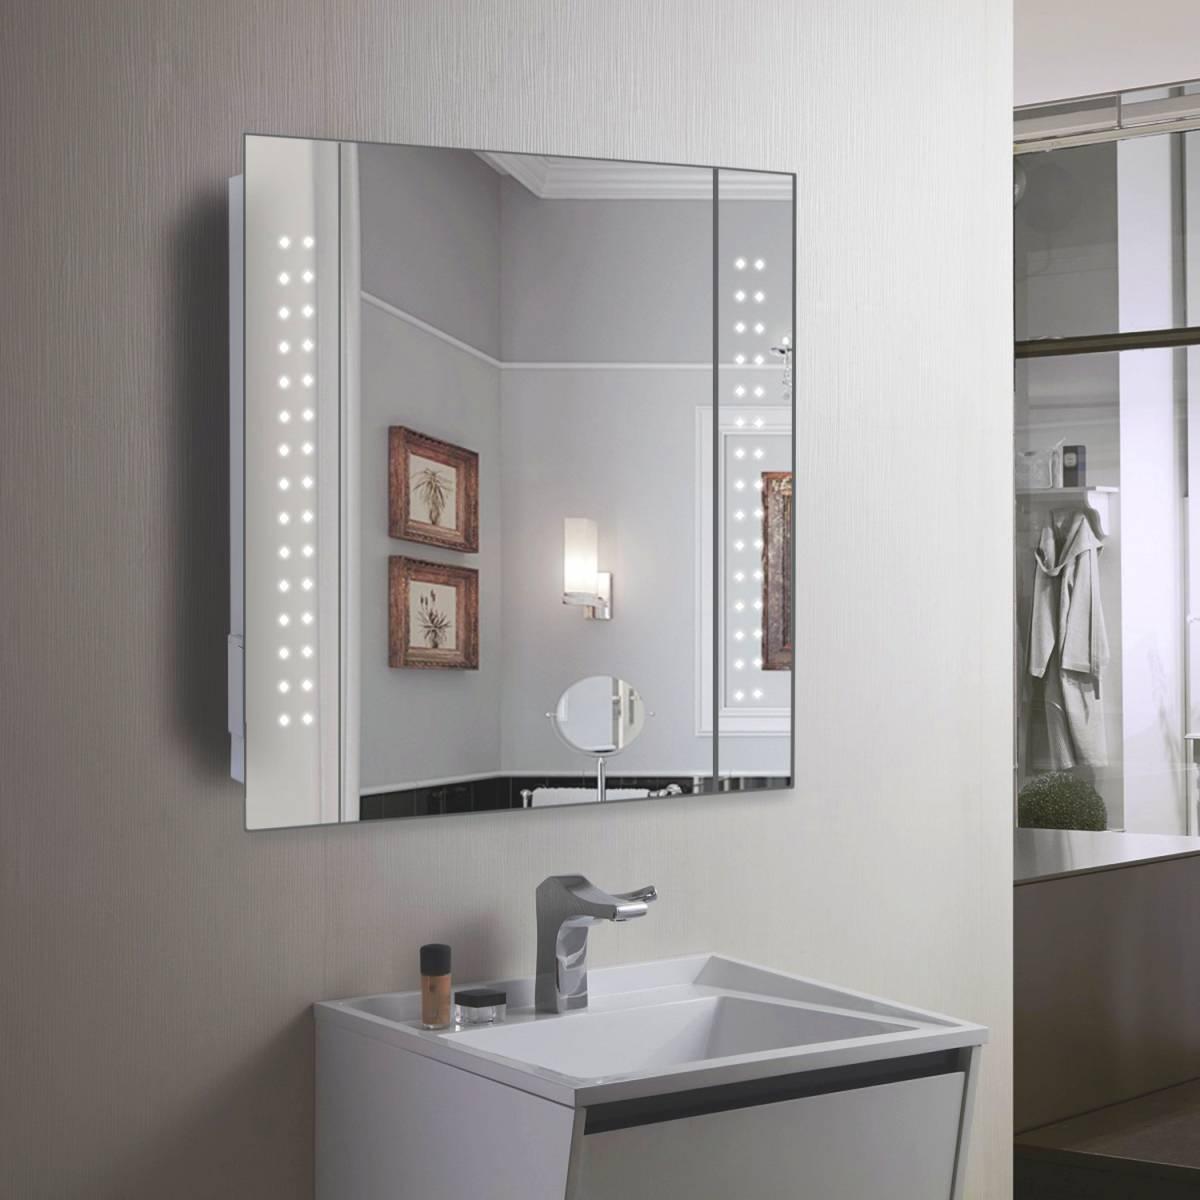 Qs Supplies Bathroom Mirrors Led Mirrors Hib Aztec With Glass Shelf